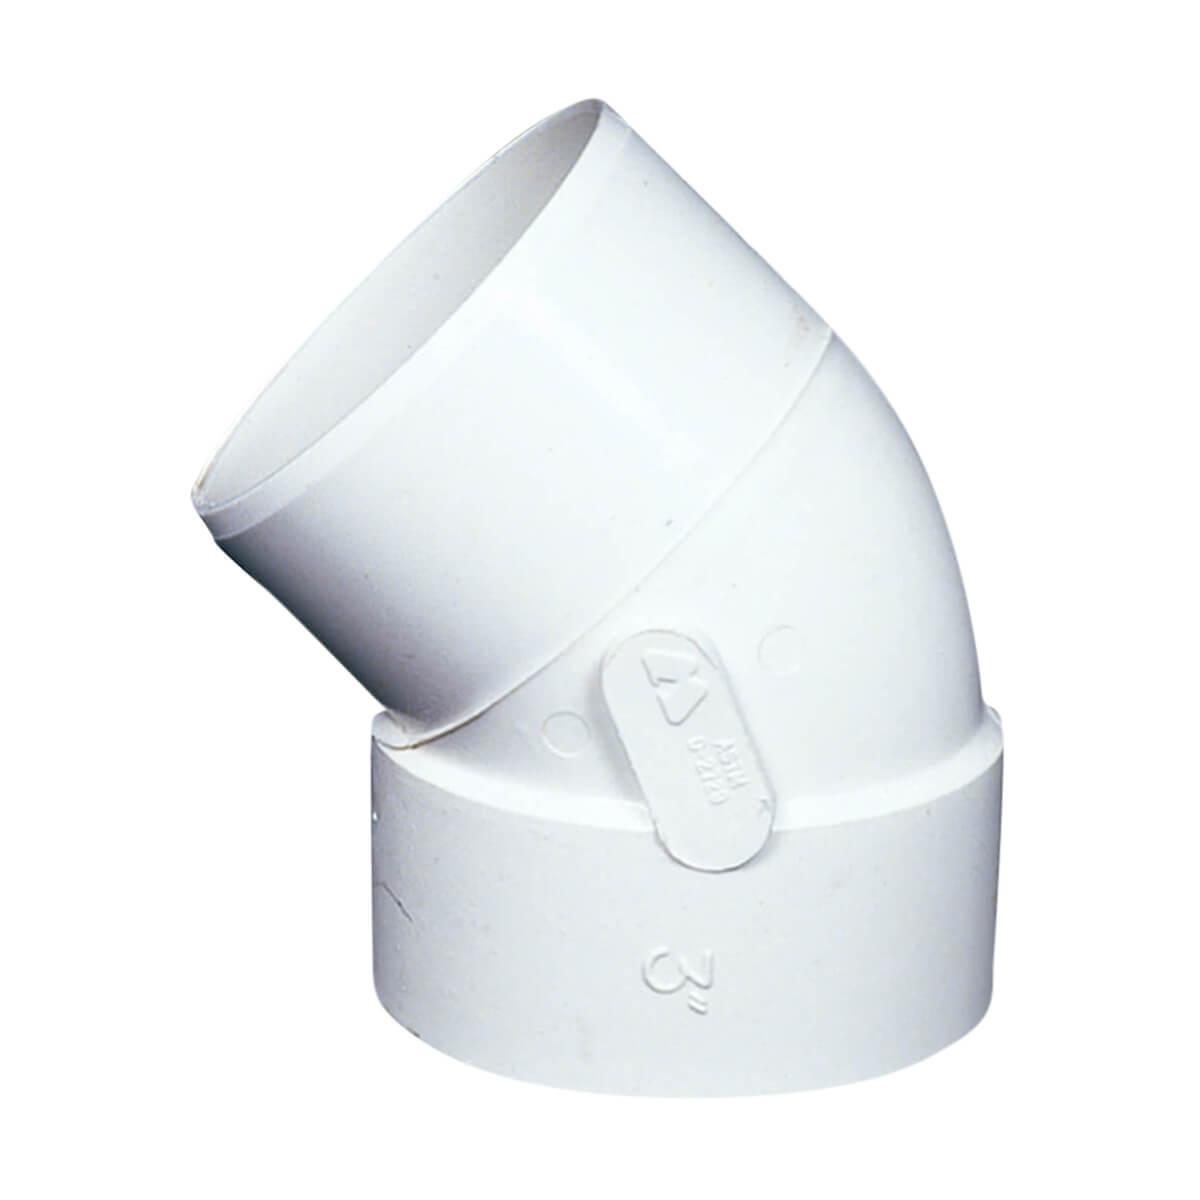 PVC-BDS 45° Elbow - Hub x Spigot - 4-in